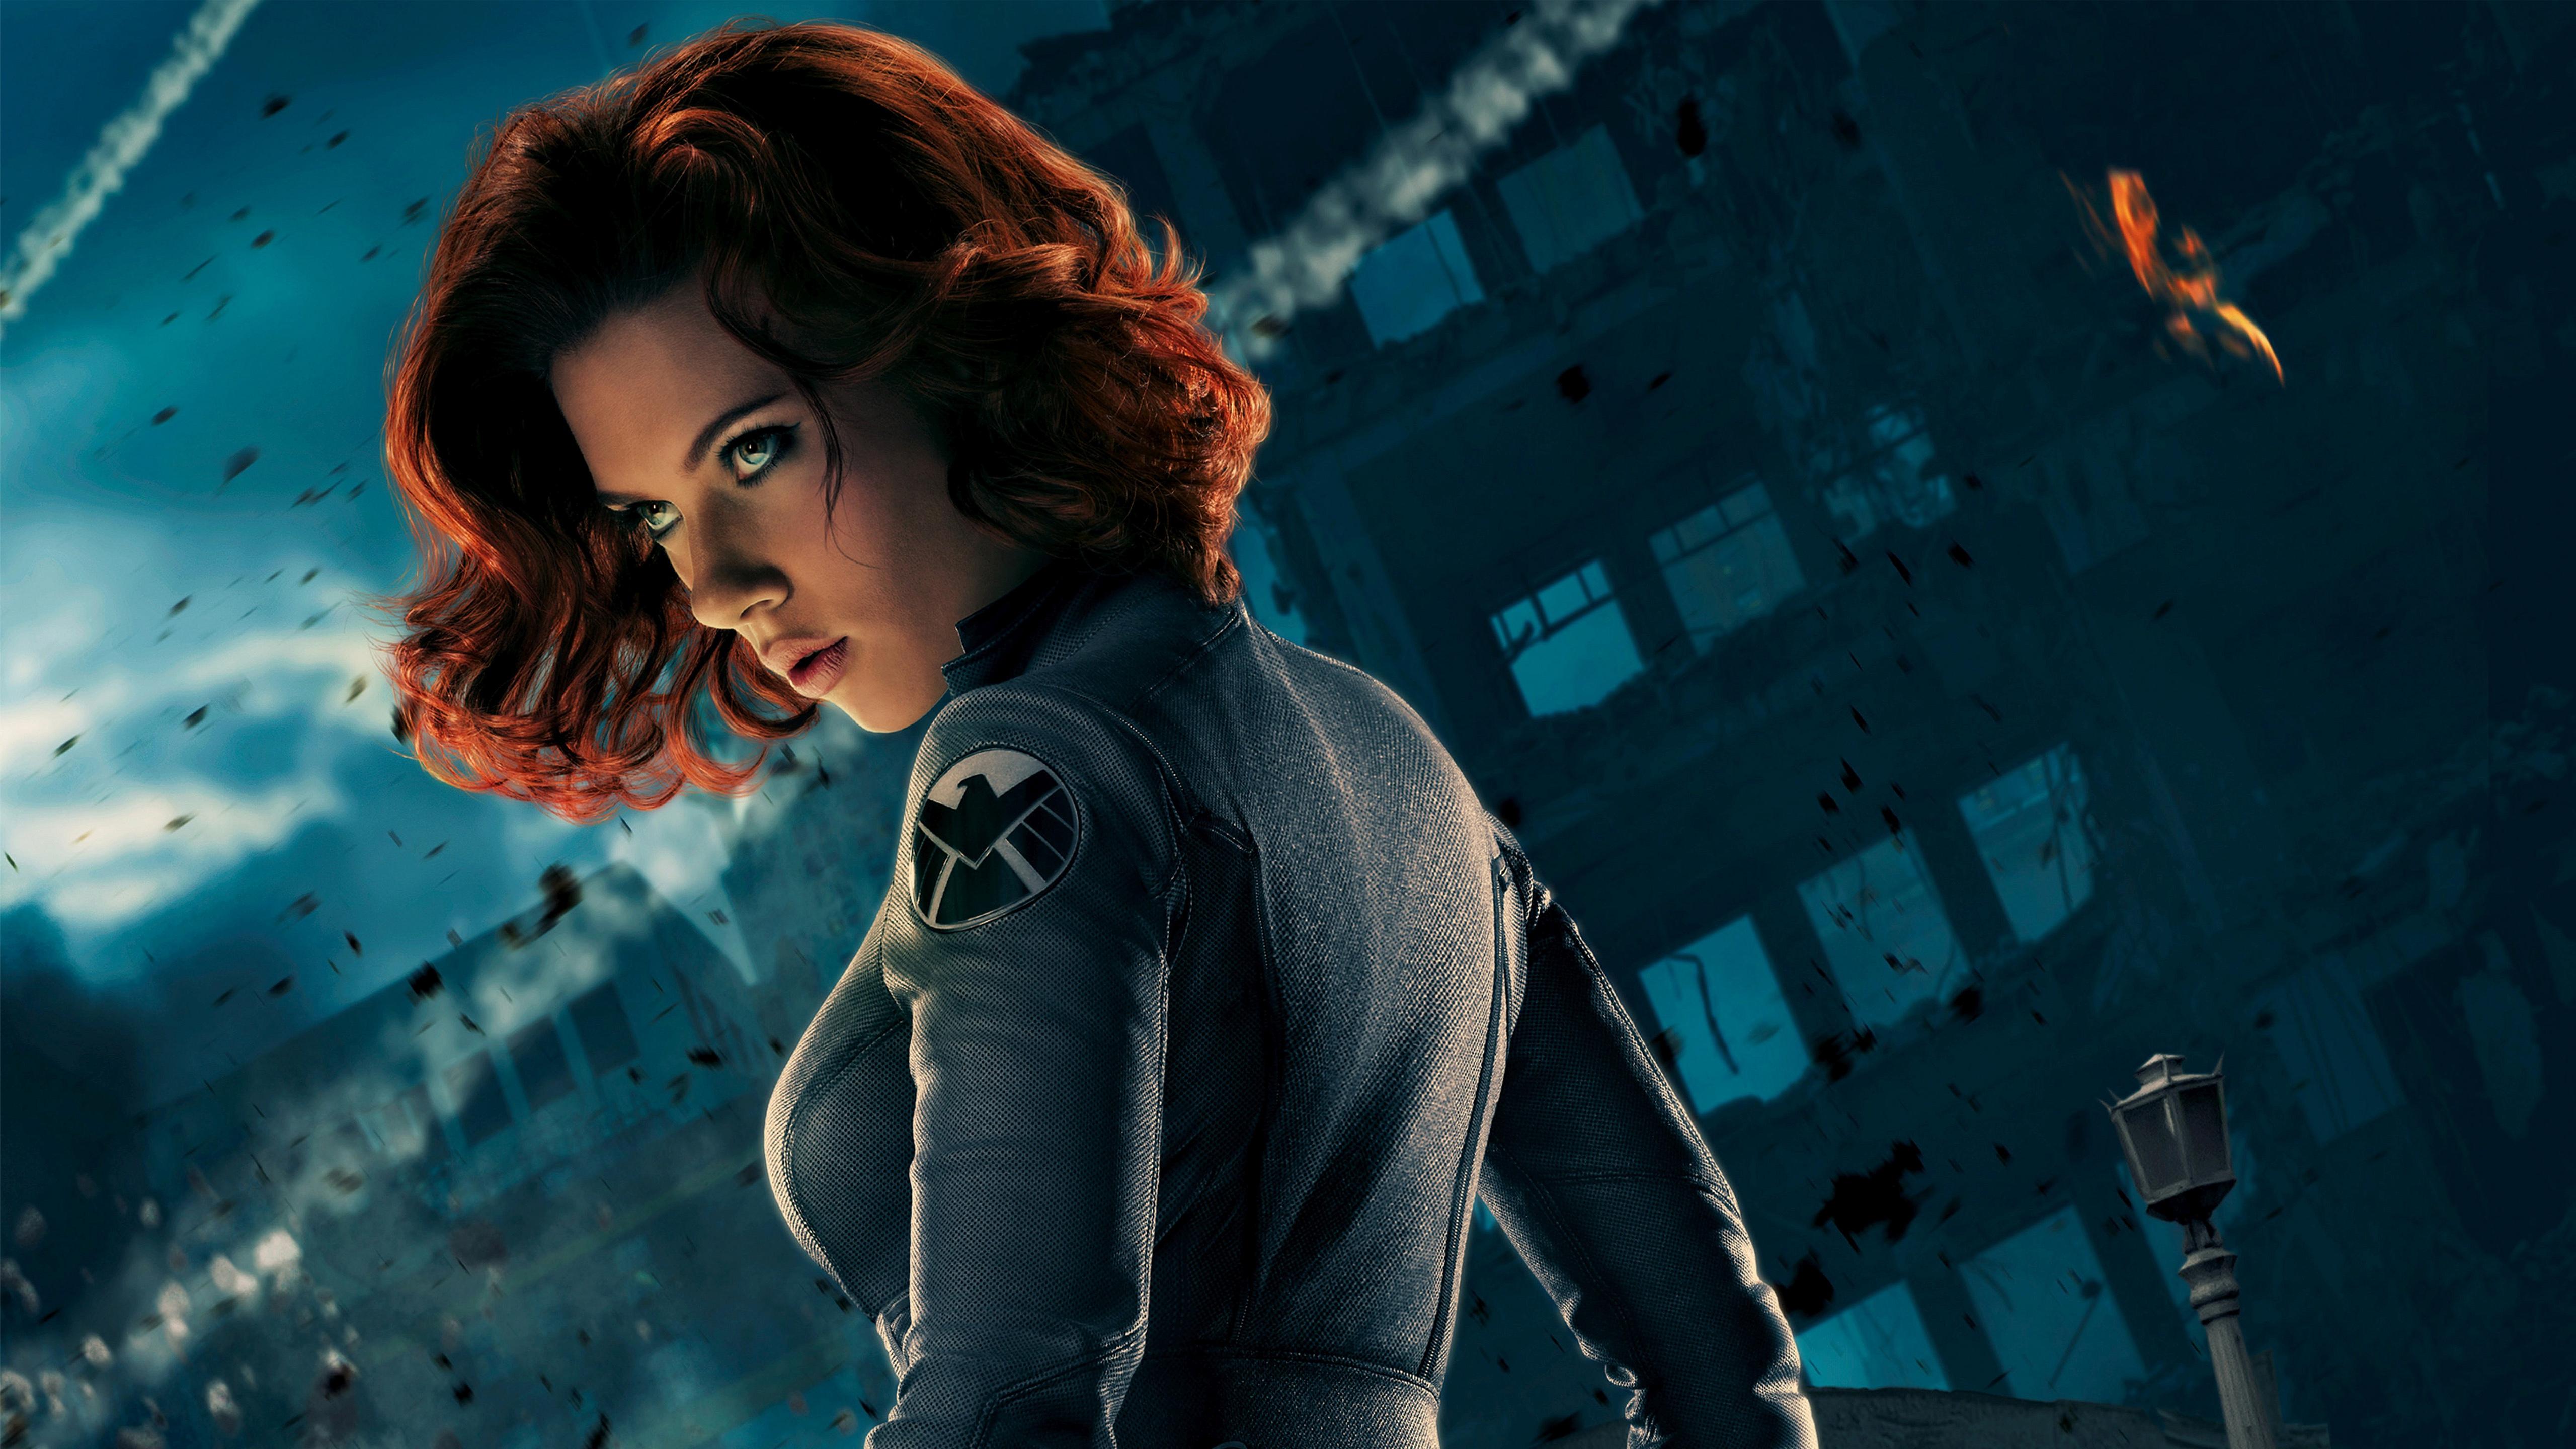 Wallpaper : Scarlett Johansson, actor, women, Black Widow